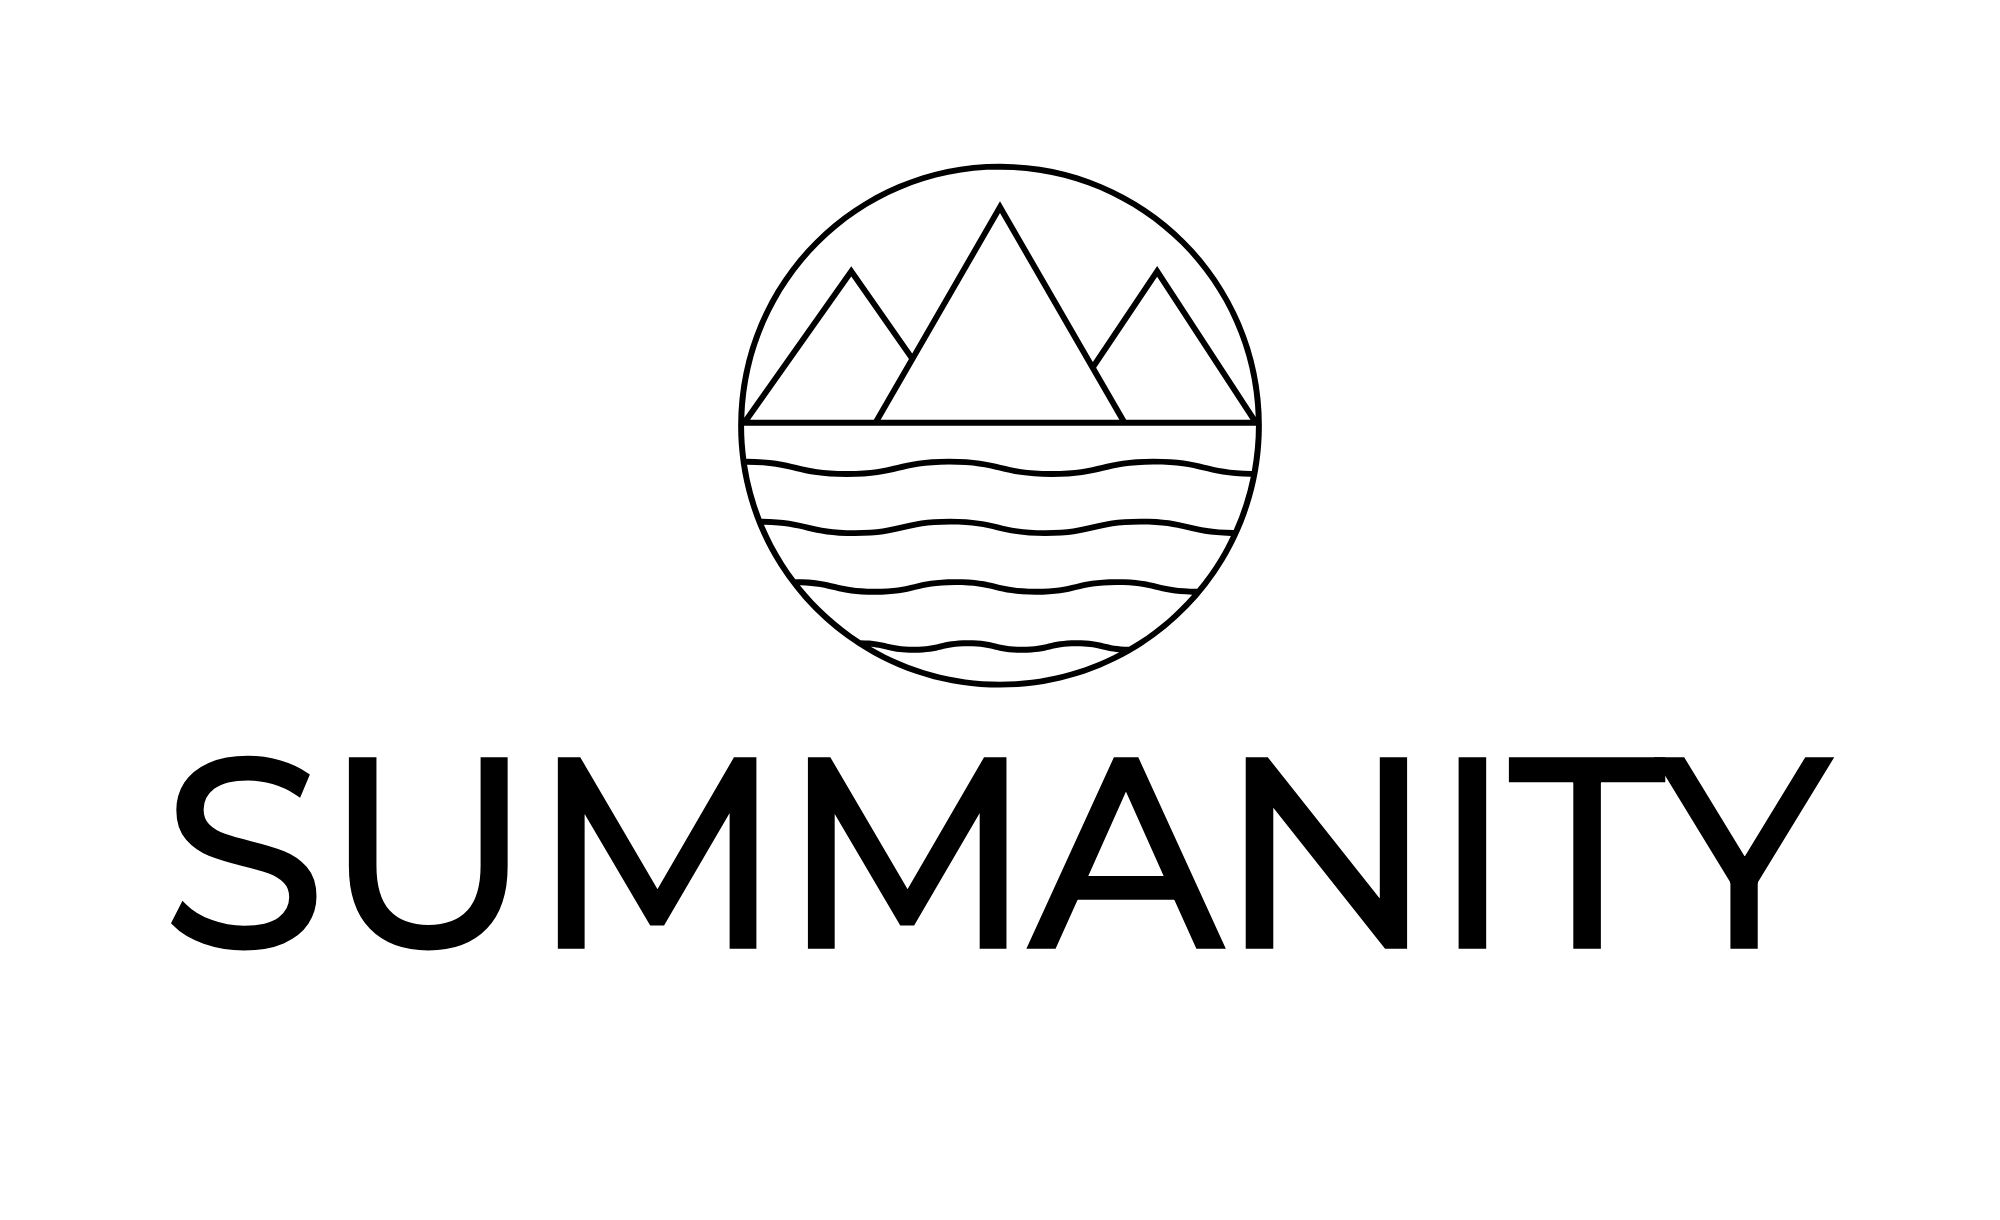 SUMMANITY-logo (1).png